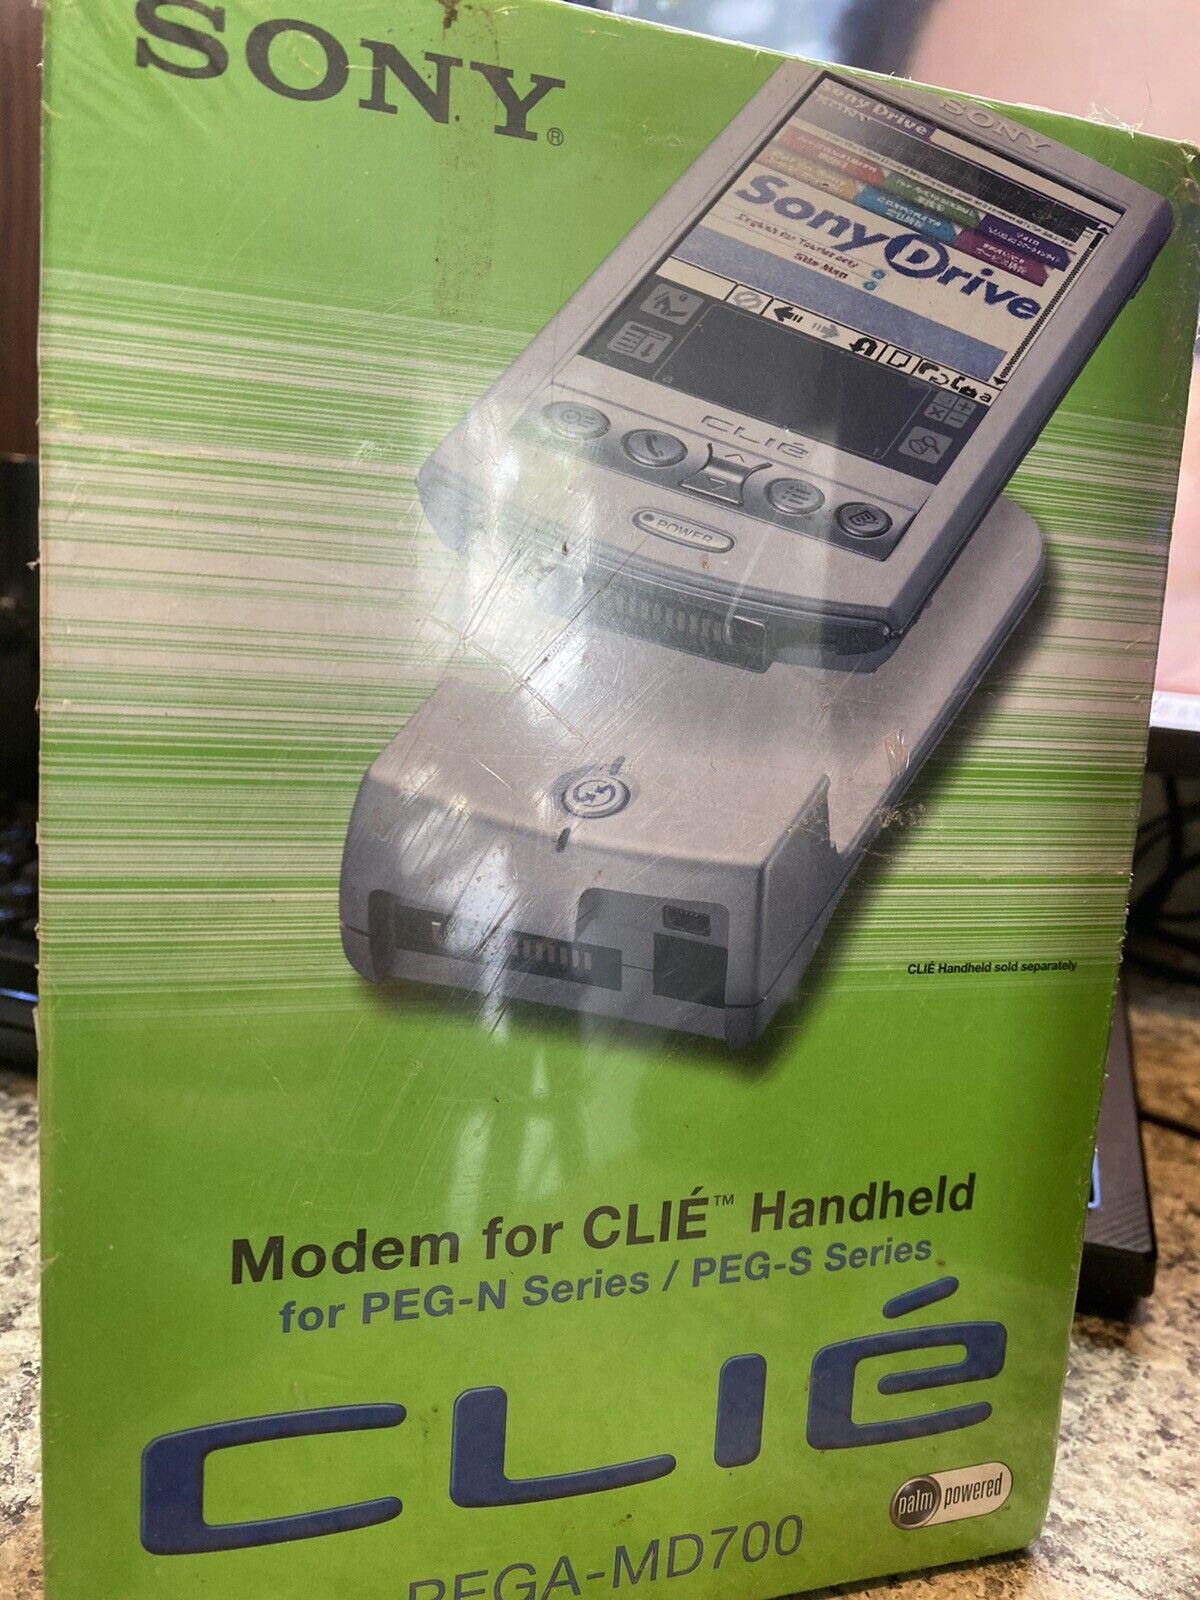 NEW Sealed Sony PEGA-MD700 56 Kbps Modem For CLIE Handheld PEG N/S Series